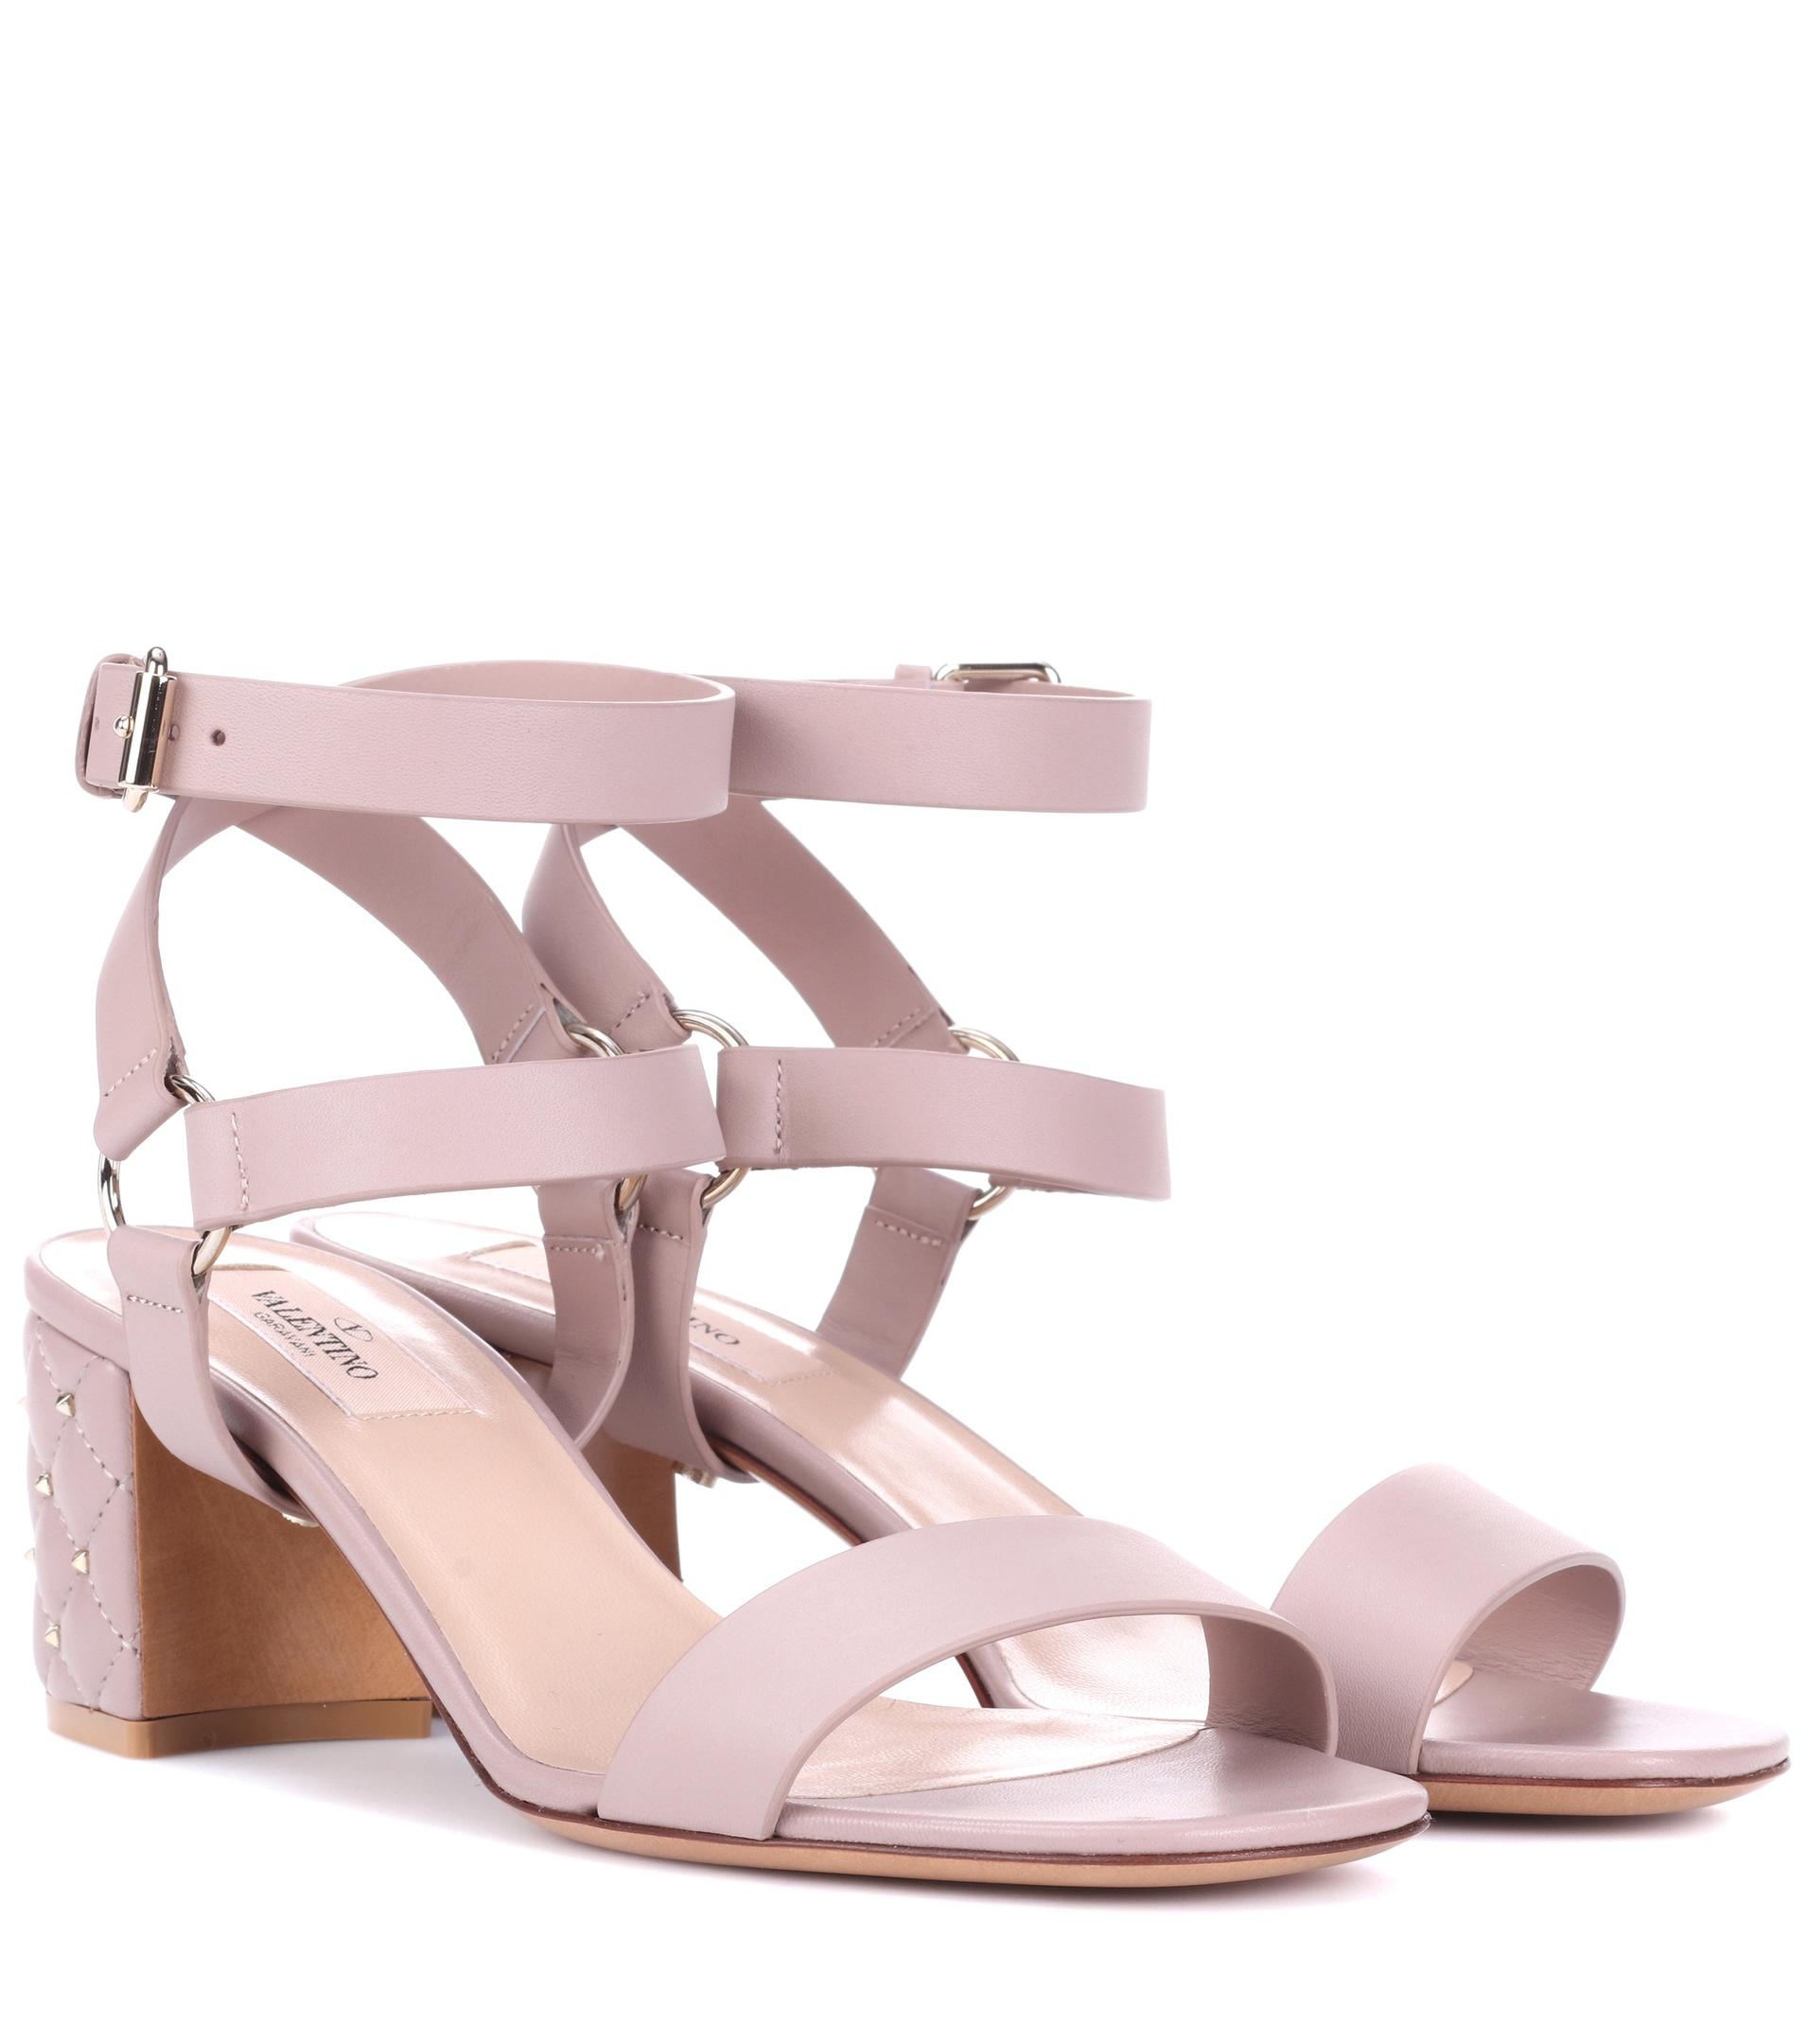 Valentino Garavani The Rockstud Leather And Suede Sandals - Pink Valentino 5A1WtKuUBl